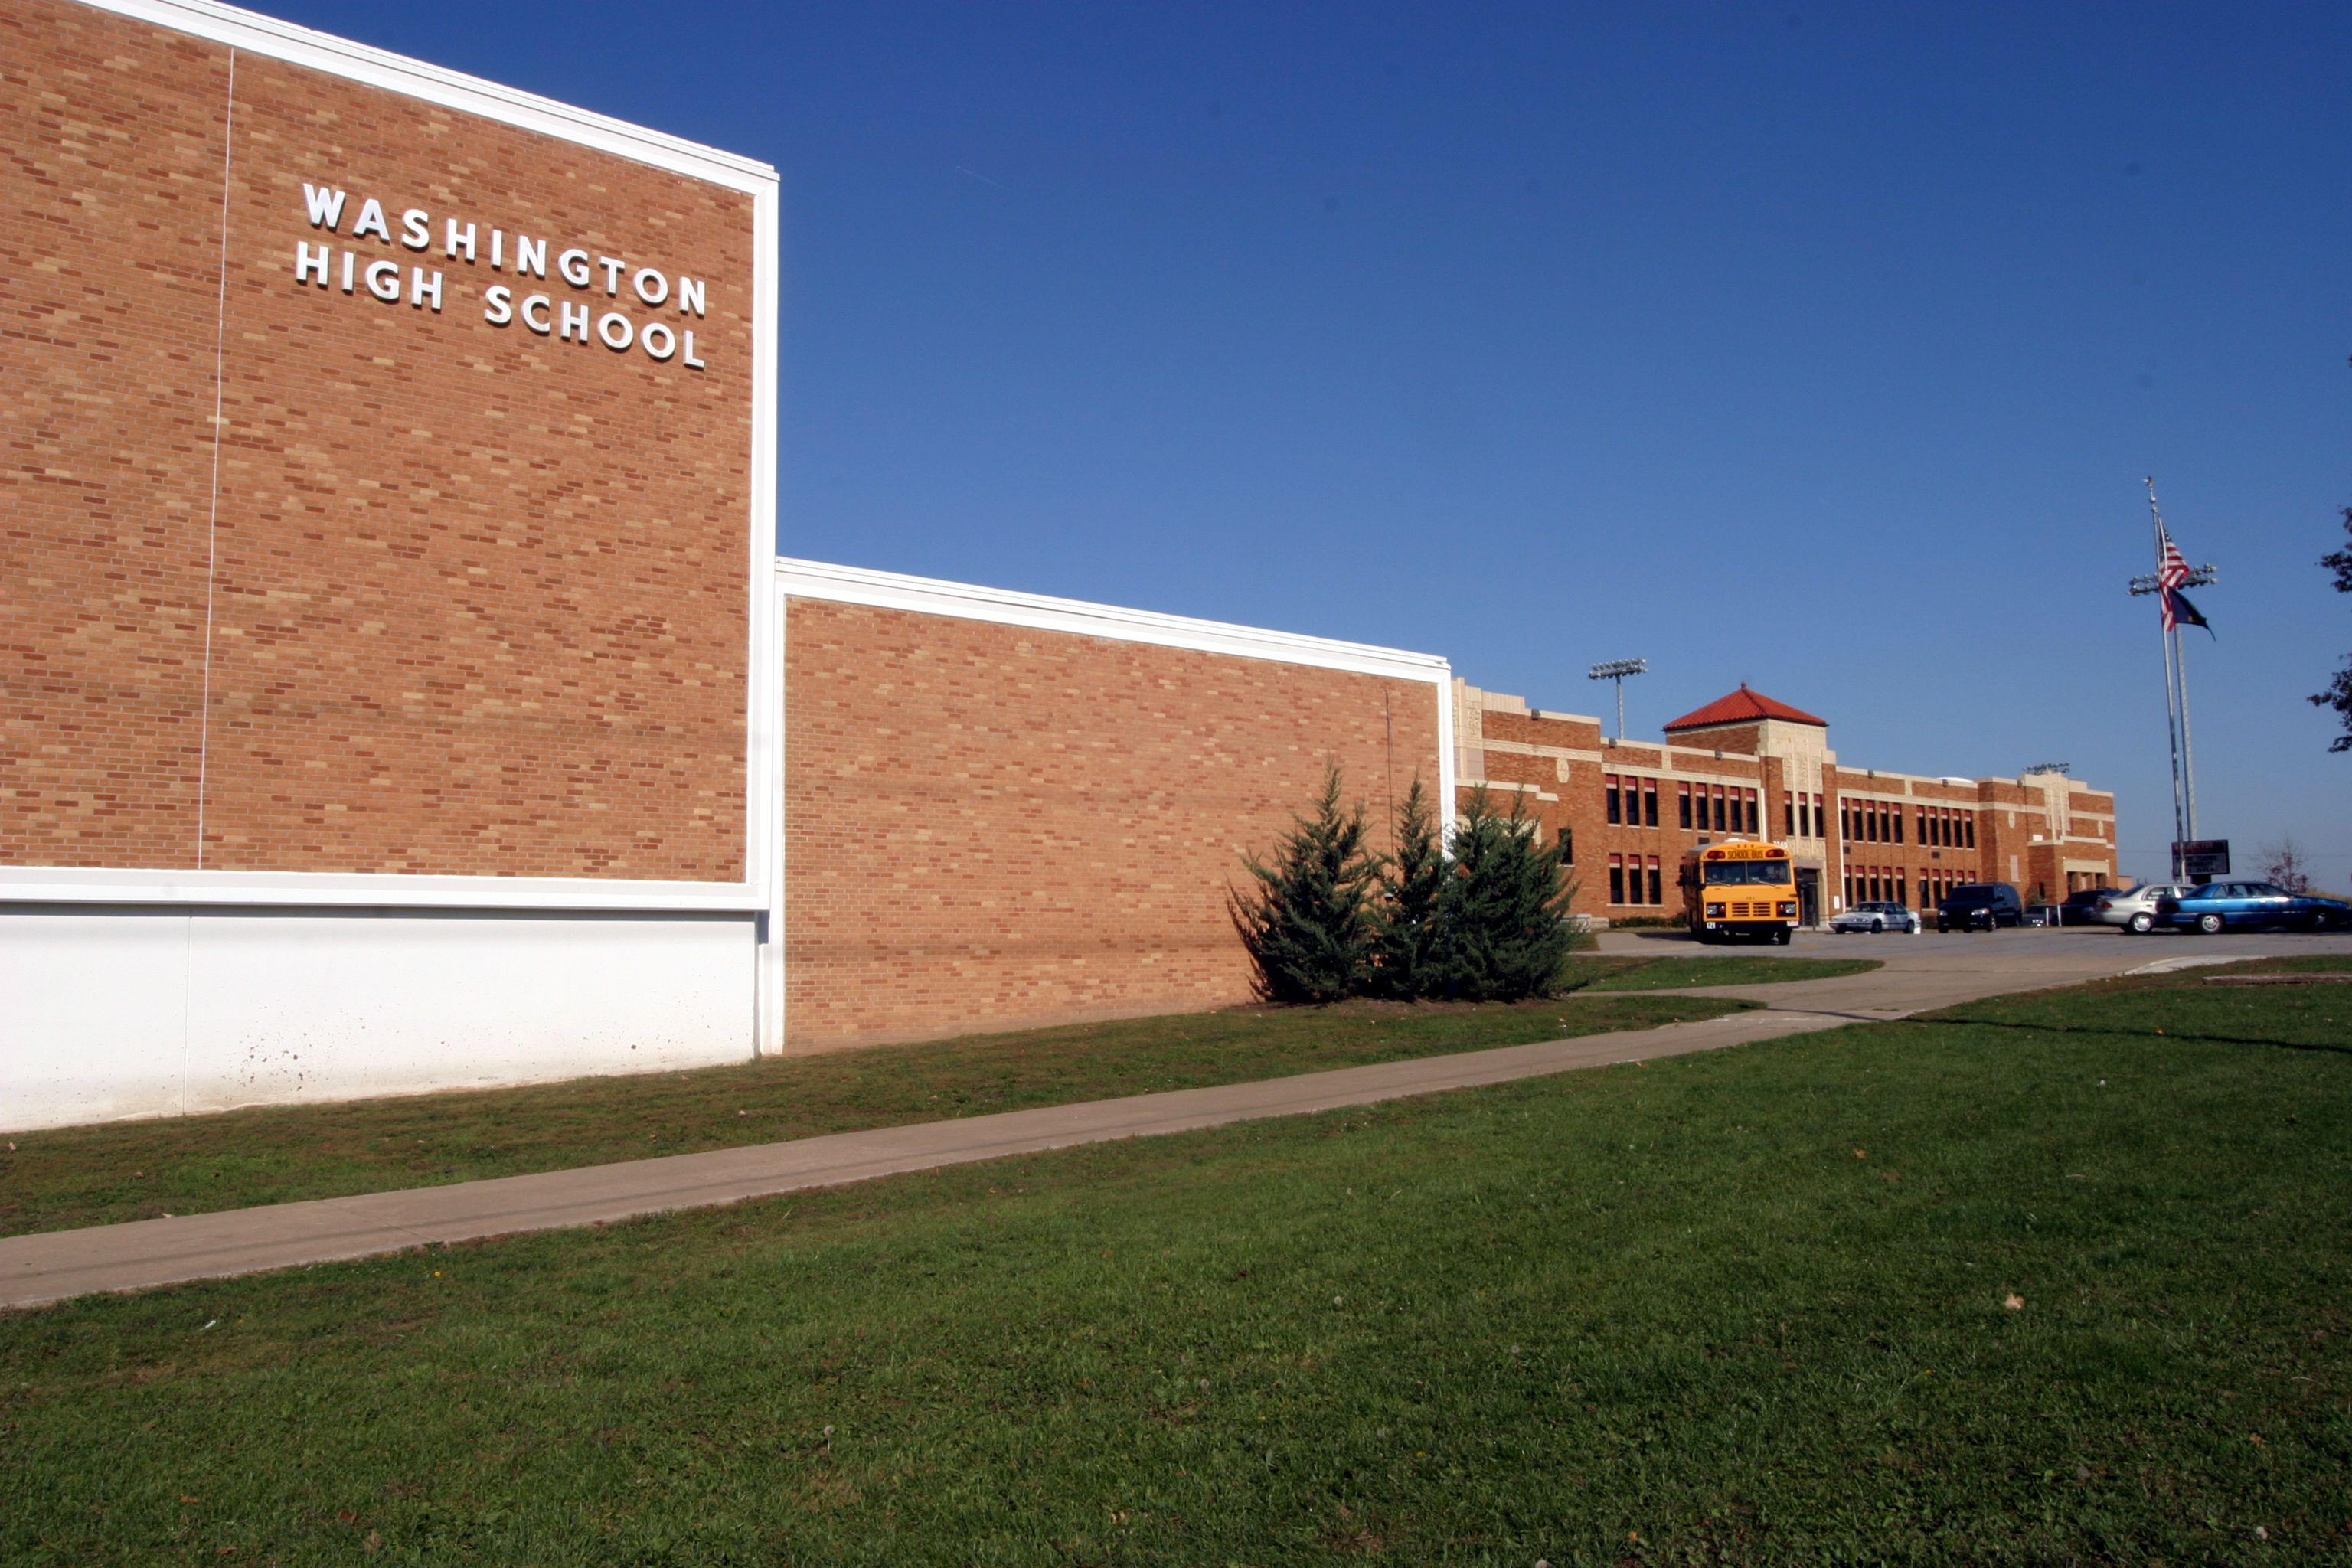 Washington High School, Kansas City, Kansas (Wyandotte County) Go Wildcats!